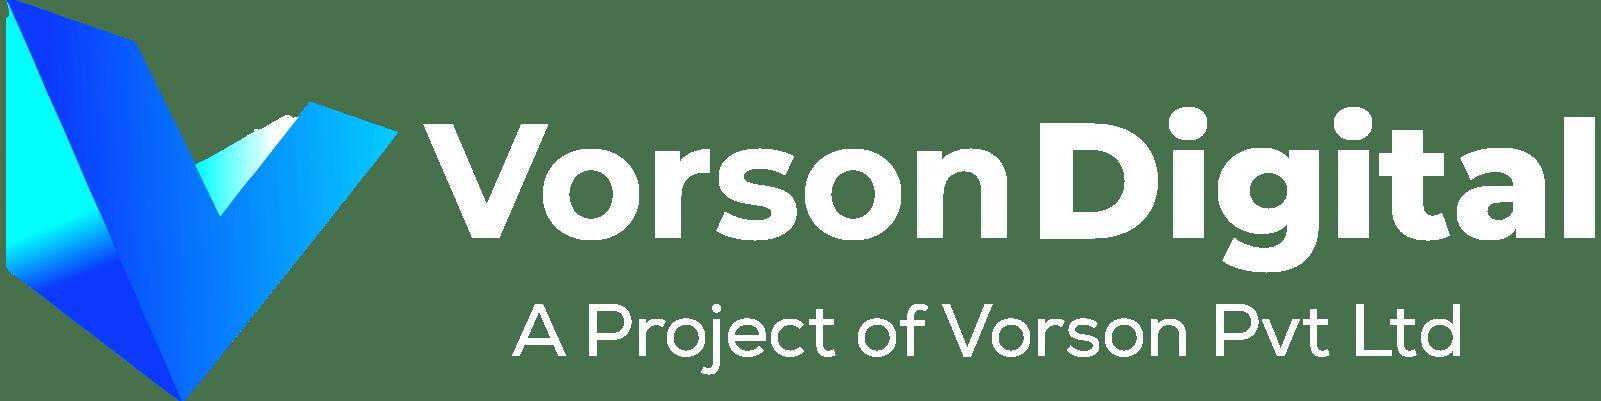 Vorson Digital